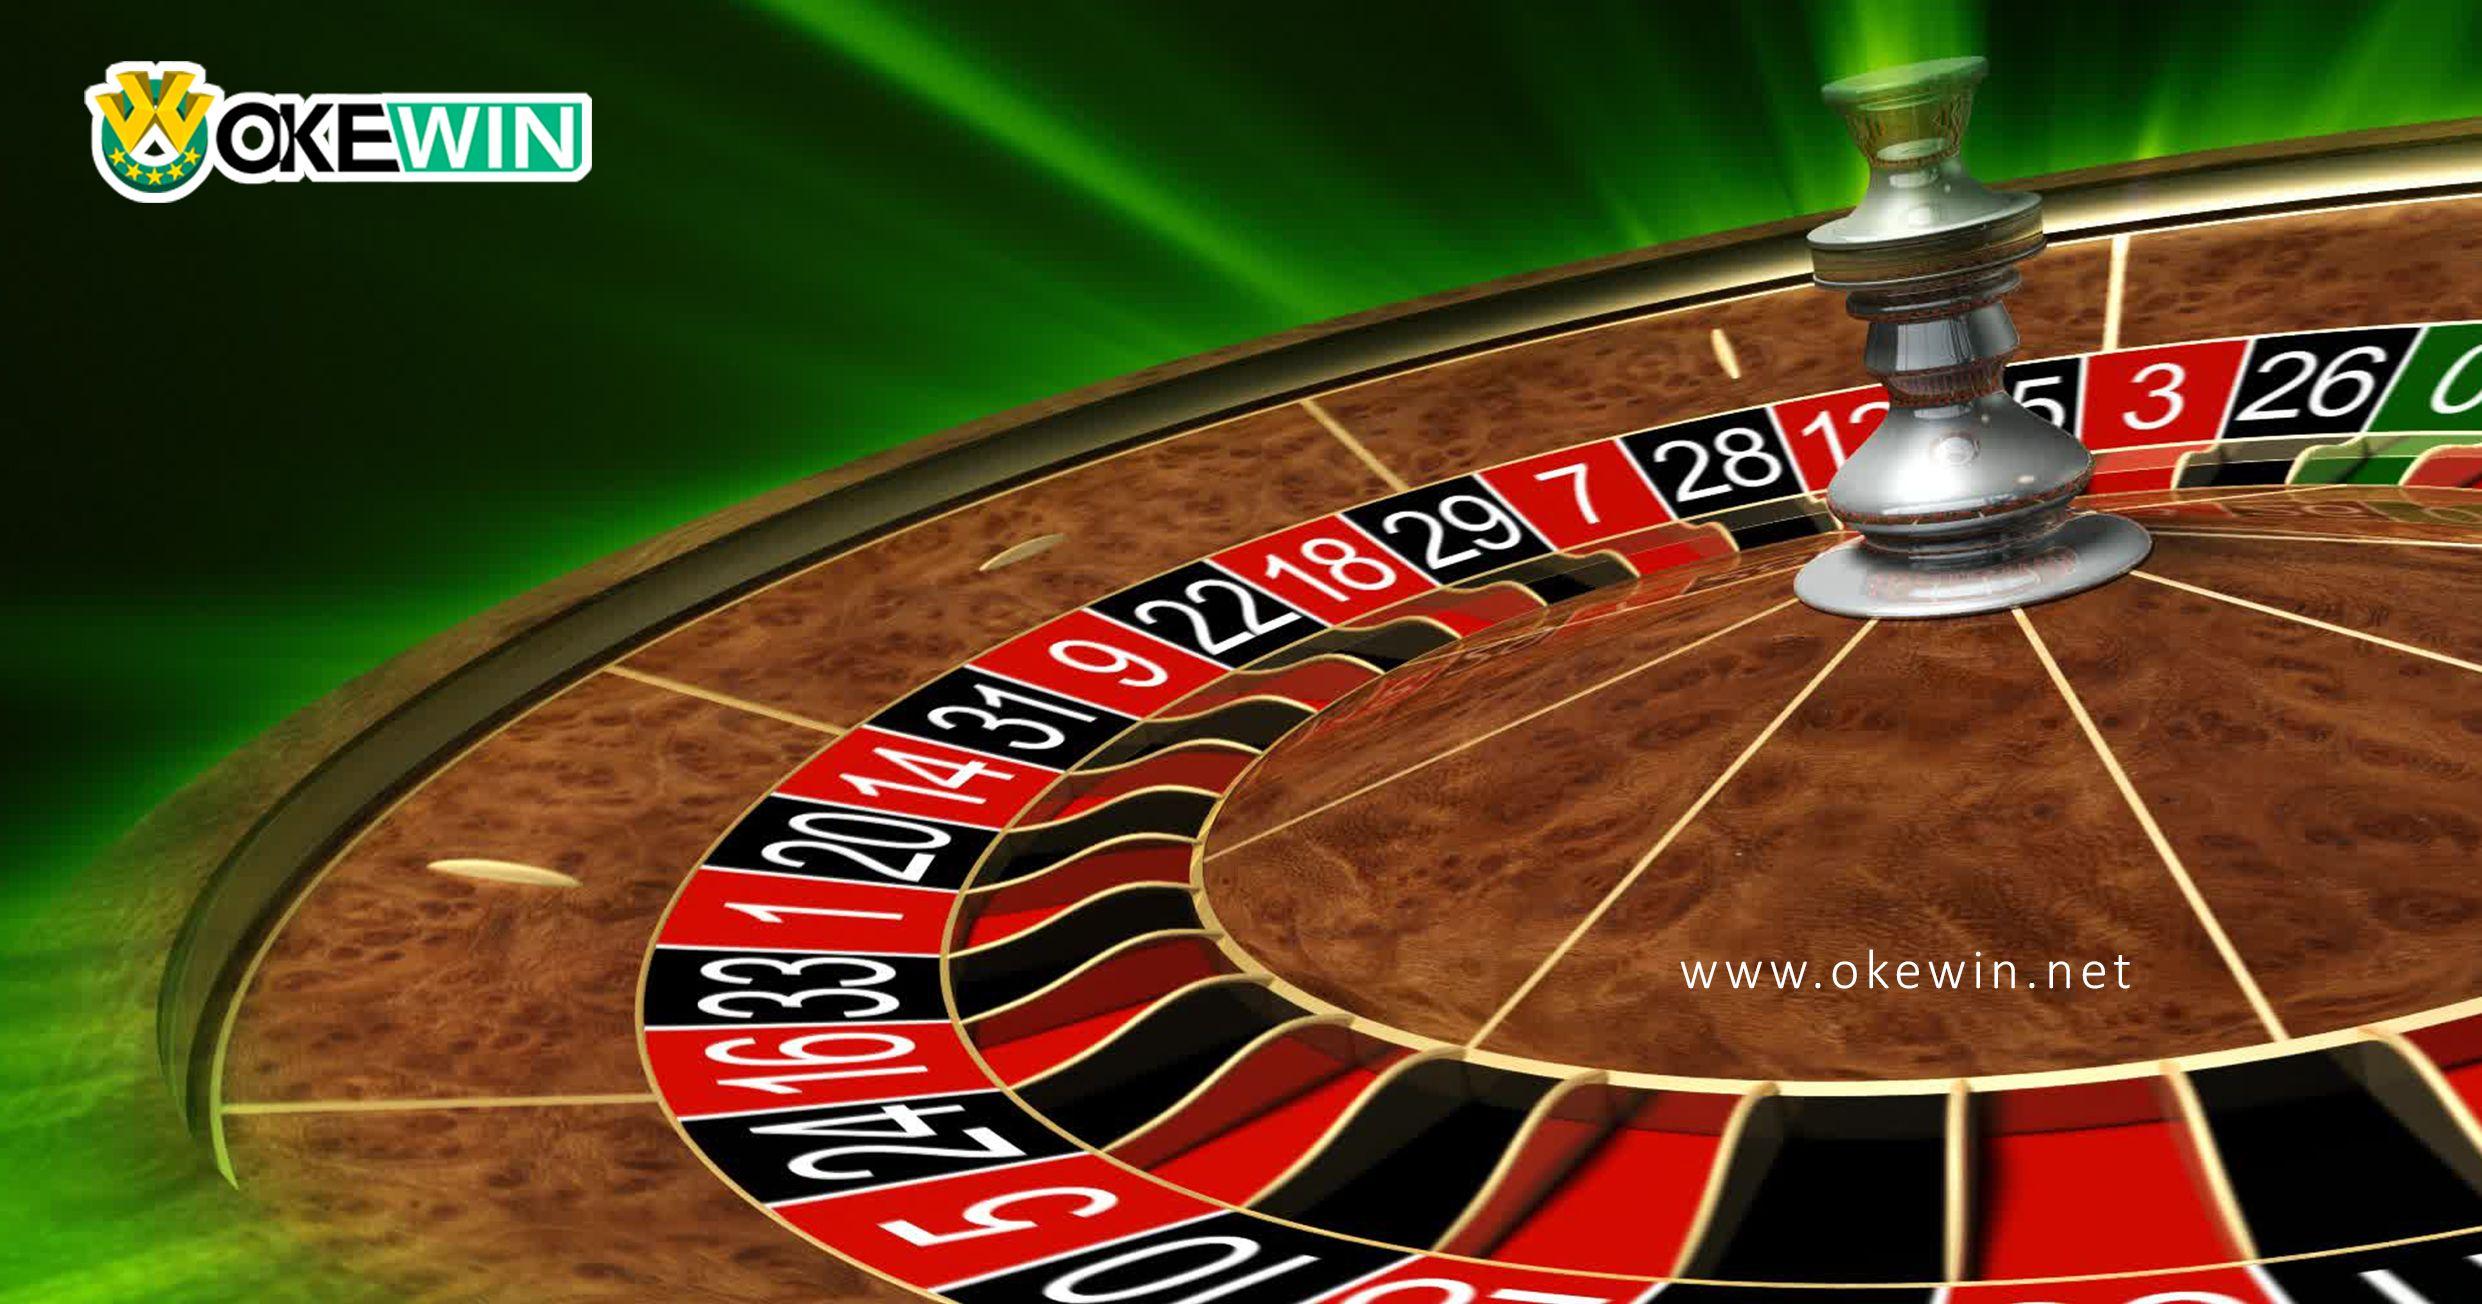 Sbobet Casino Agen Sbobet Games Play Now In Indonesia Okewin Net Adalah Agen Sbobet Tepercaya Yang Melayani Pembukaan Akun Sbobet Poke Kasino Poker Pelayan